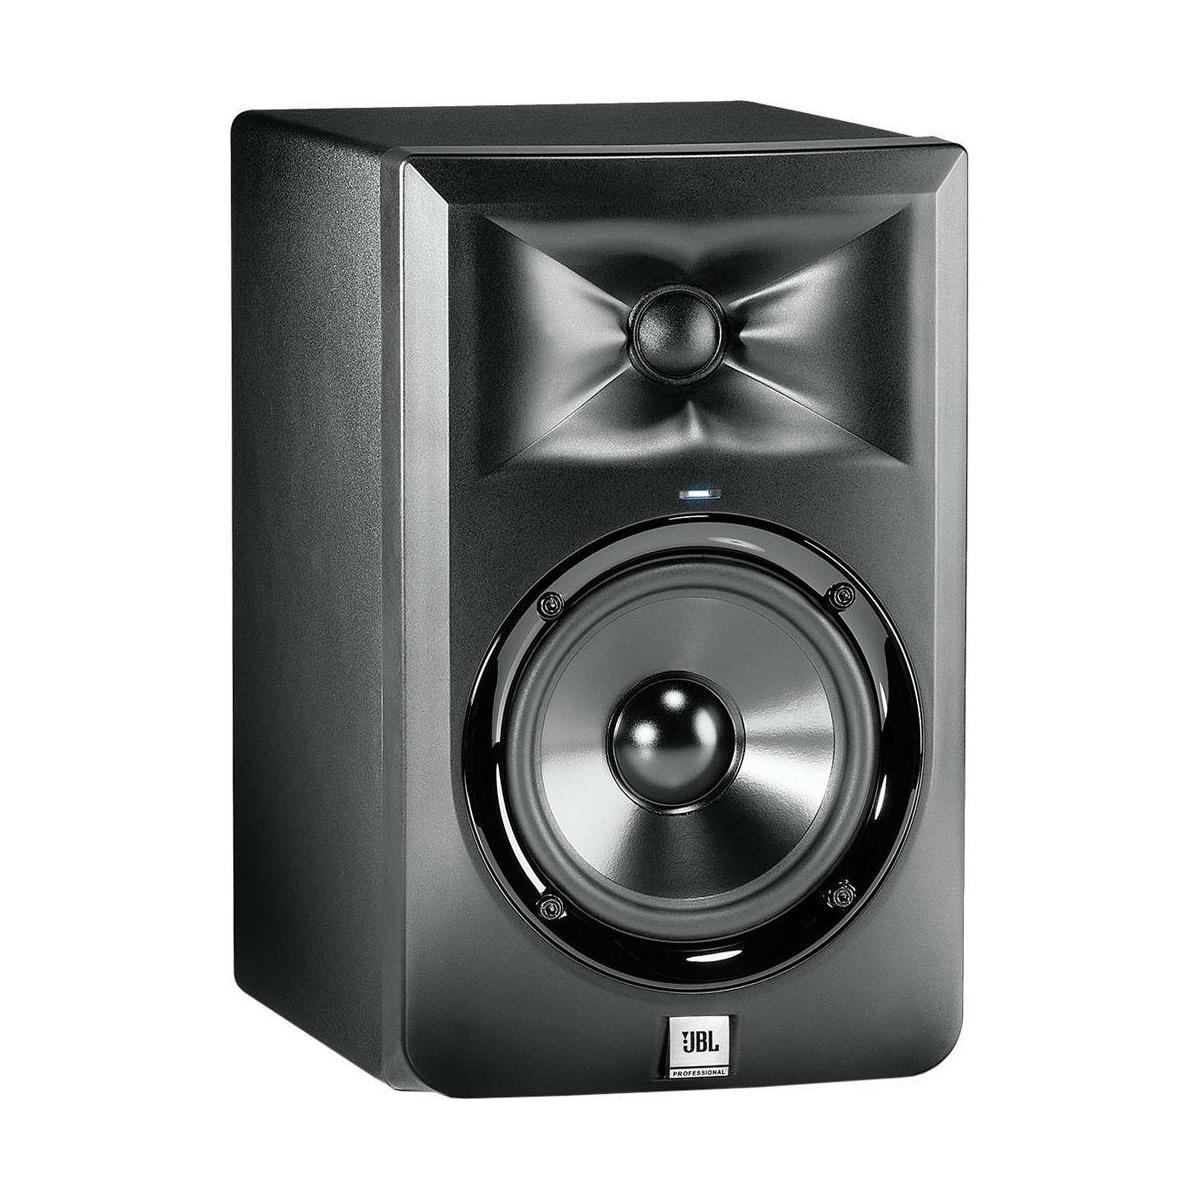 JBL LSR305 Professional Studio Monitor Speaker  $99 + Free Shipping